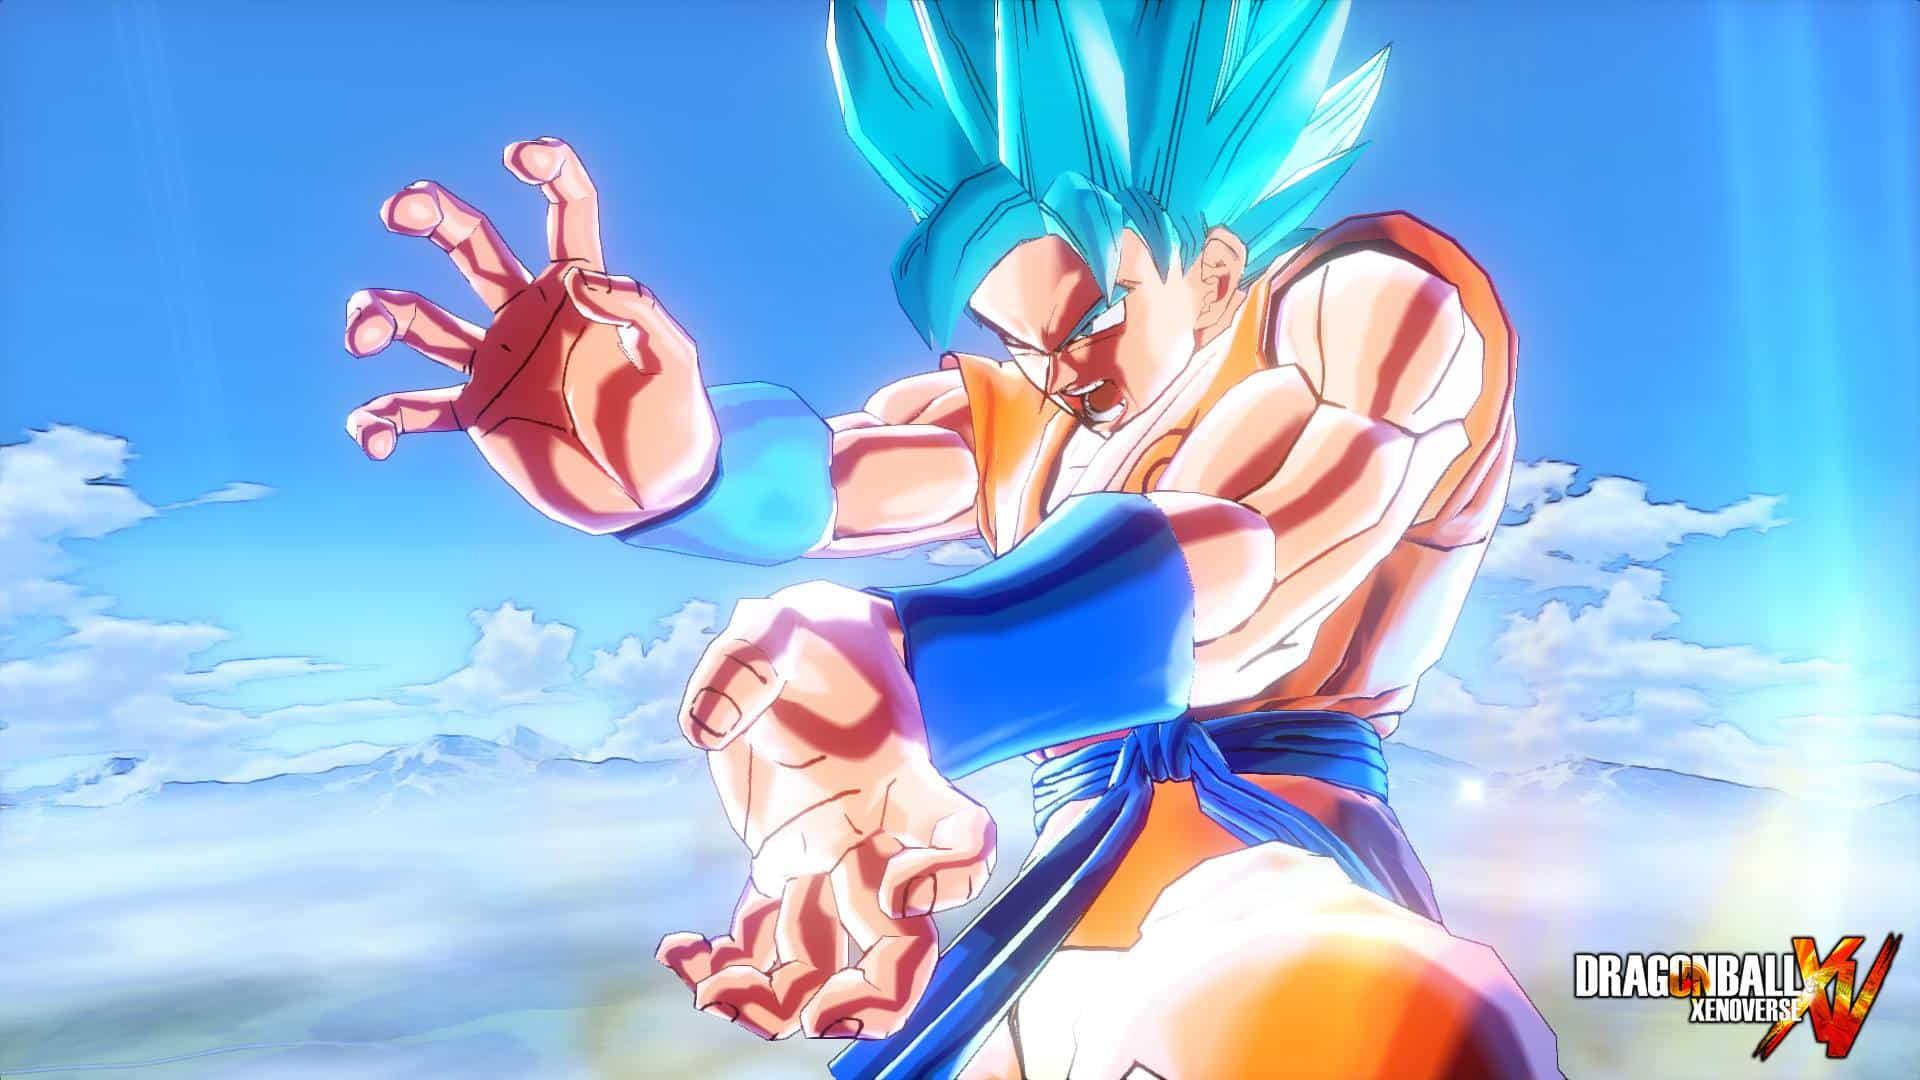 Bandai Namco rivelerà una nuova ip alla Gamescom